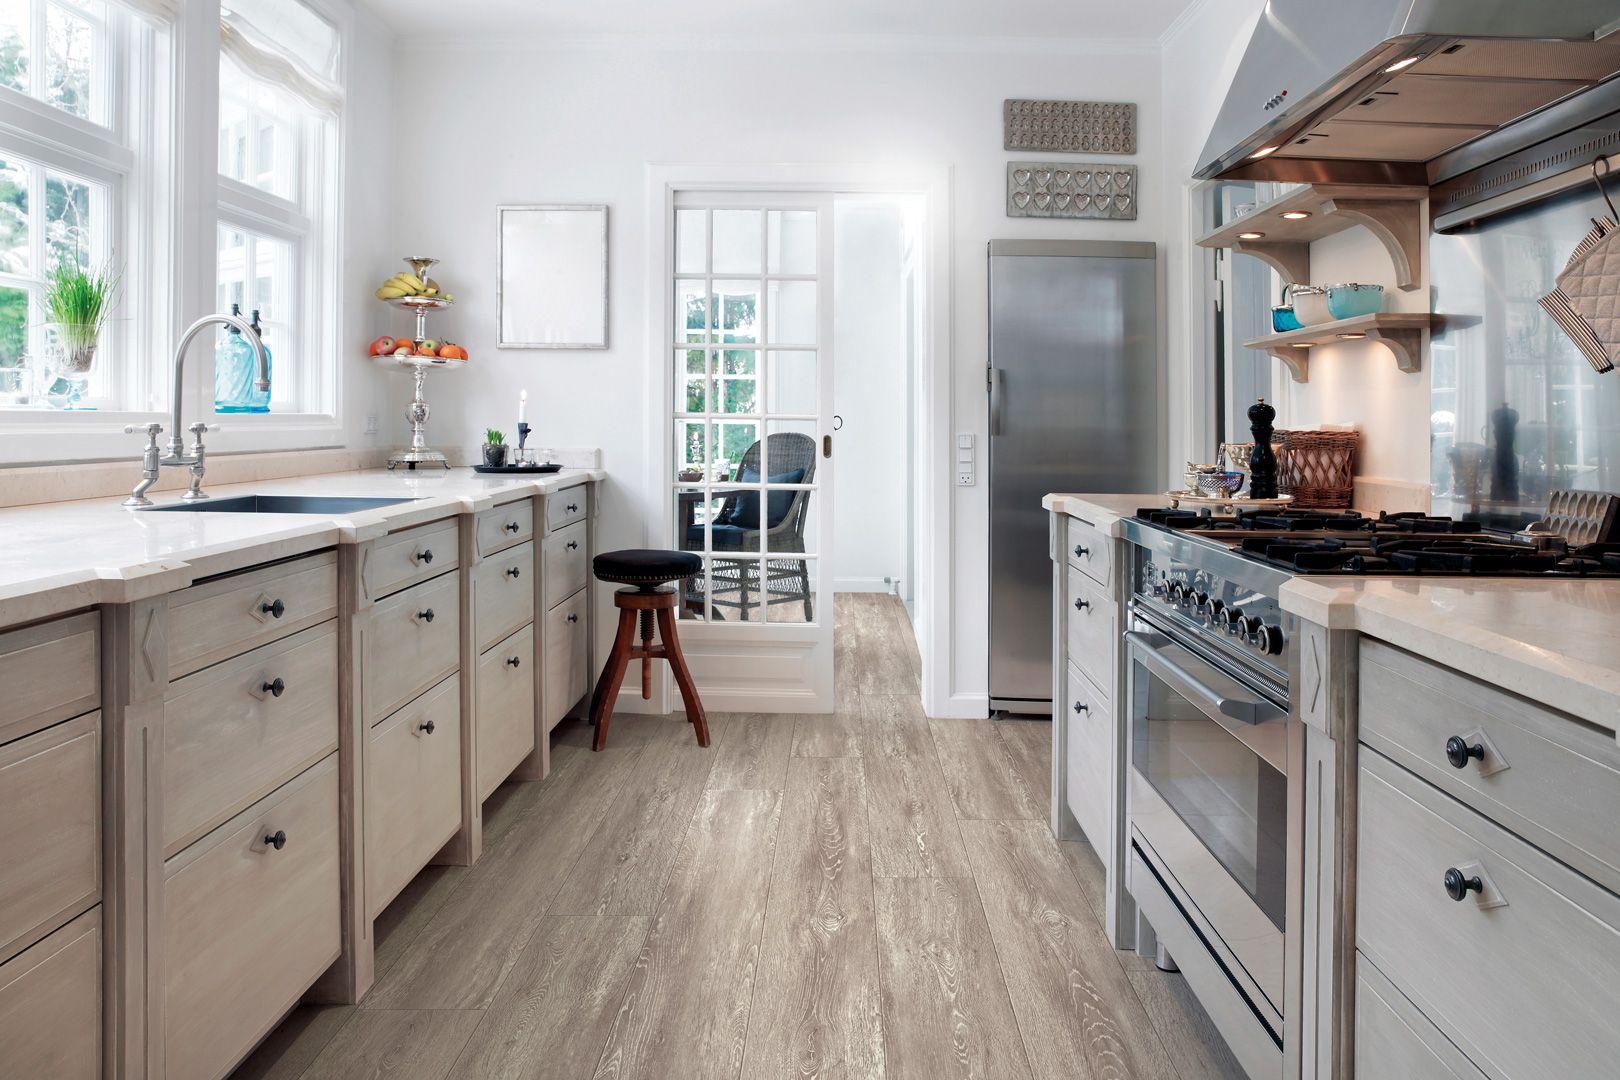 VINYL Plank Flooring | COREtec Plus HD XL Floors | Flooring Store ...